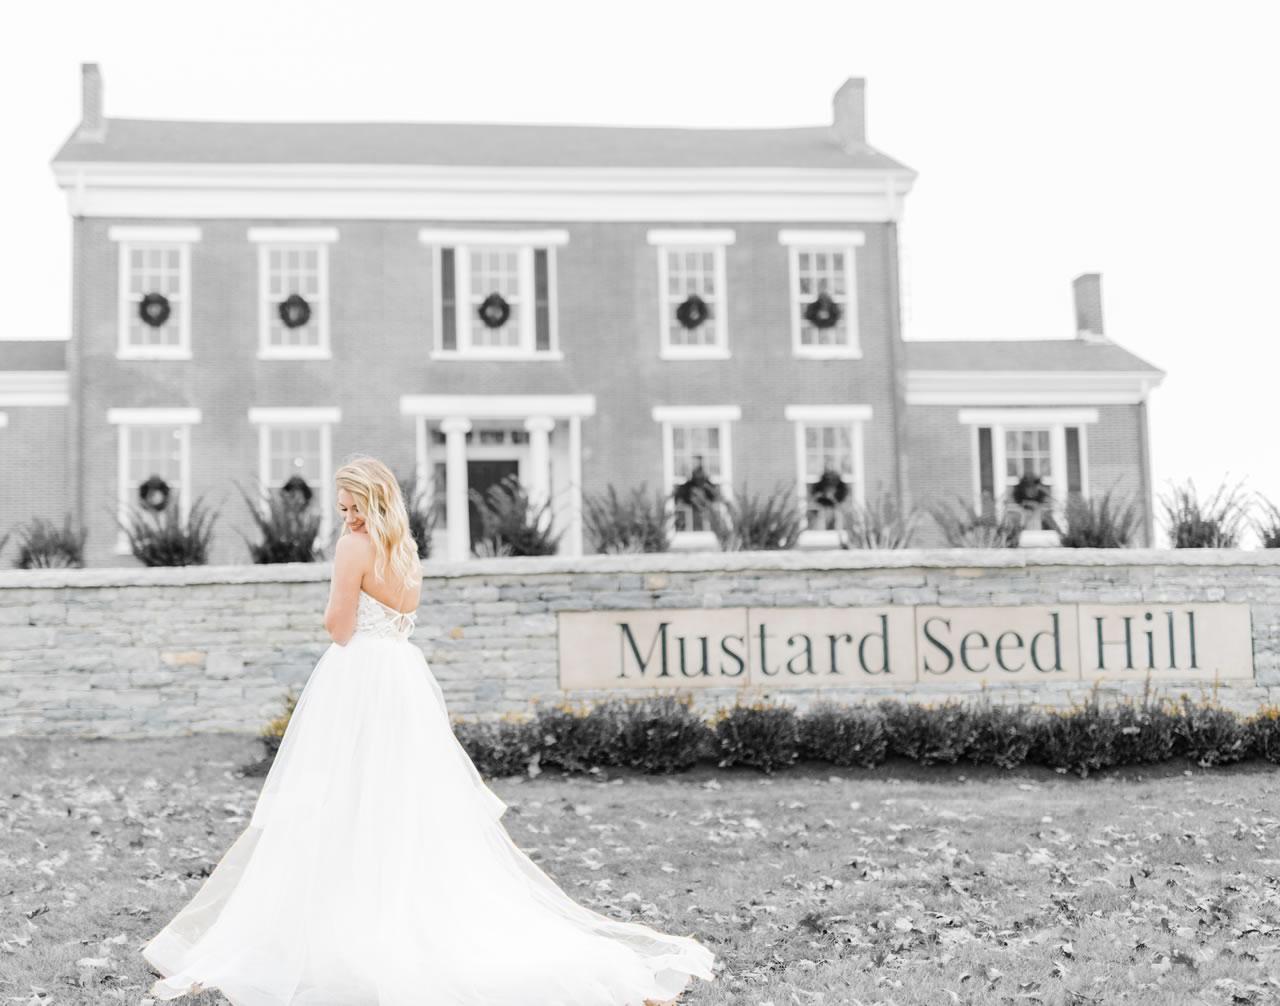 mustart seed hill image